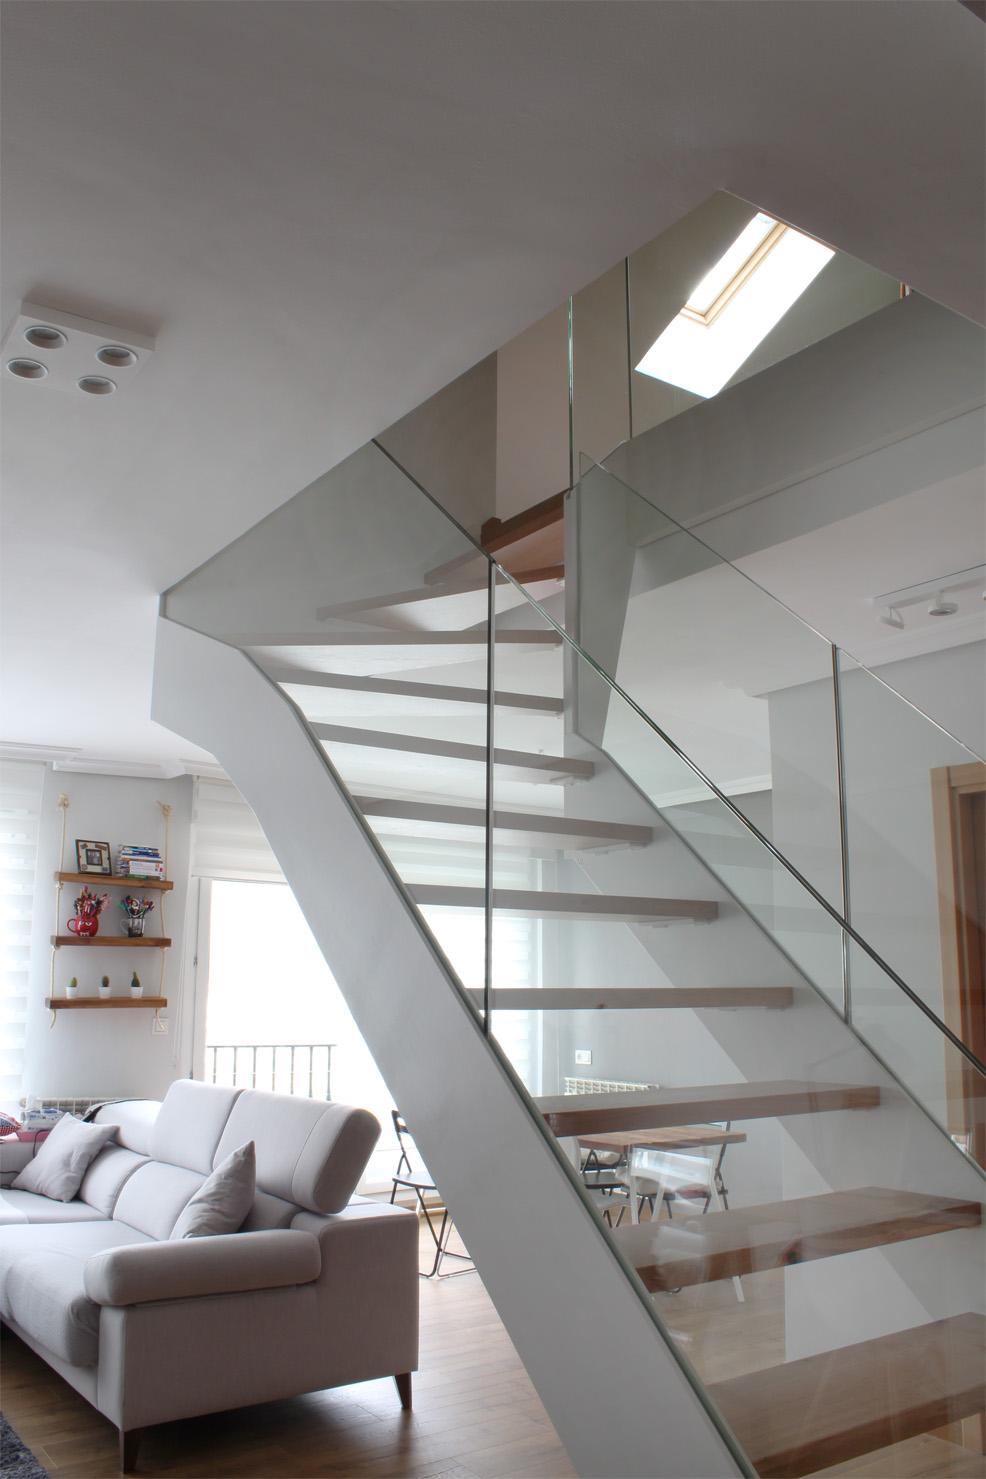 Escalera modelo l niz escalera de doble zanca con for Escalera metalica en l